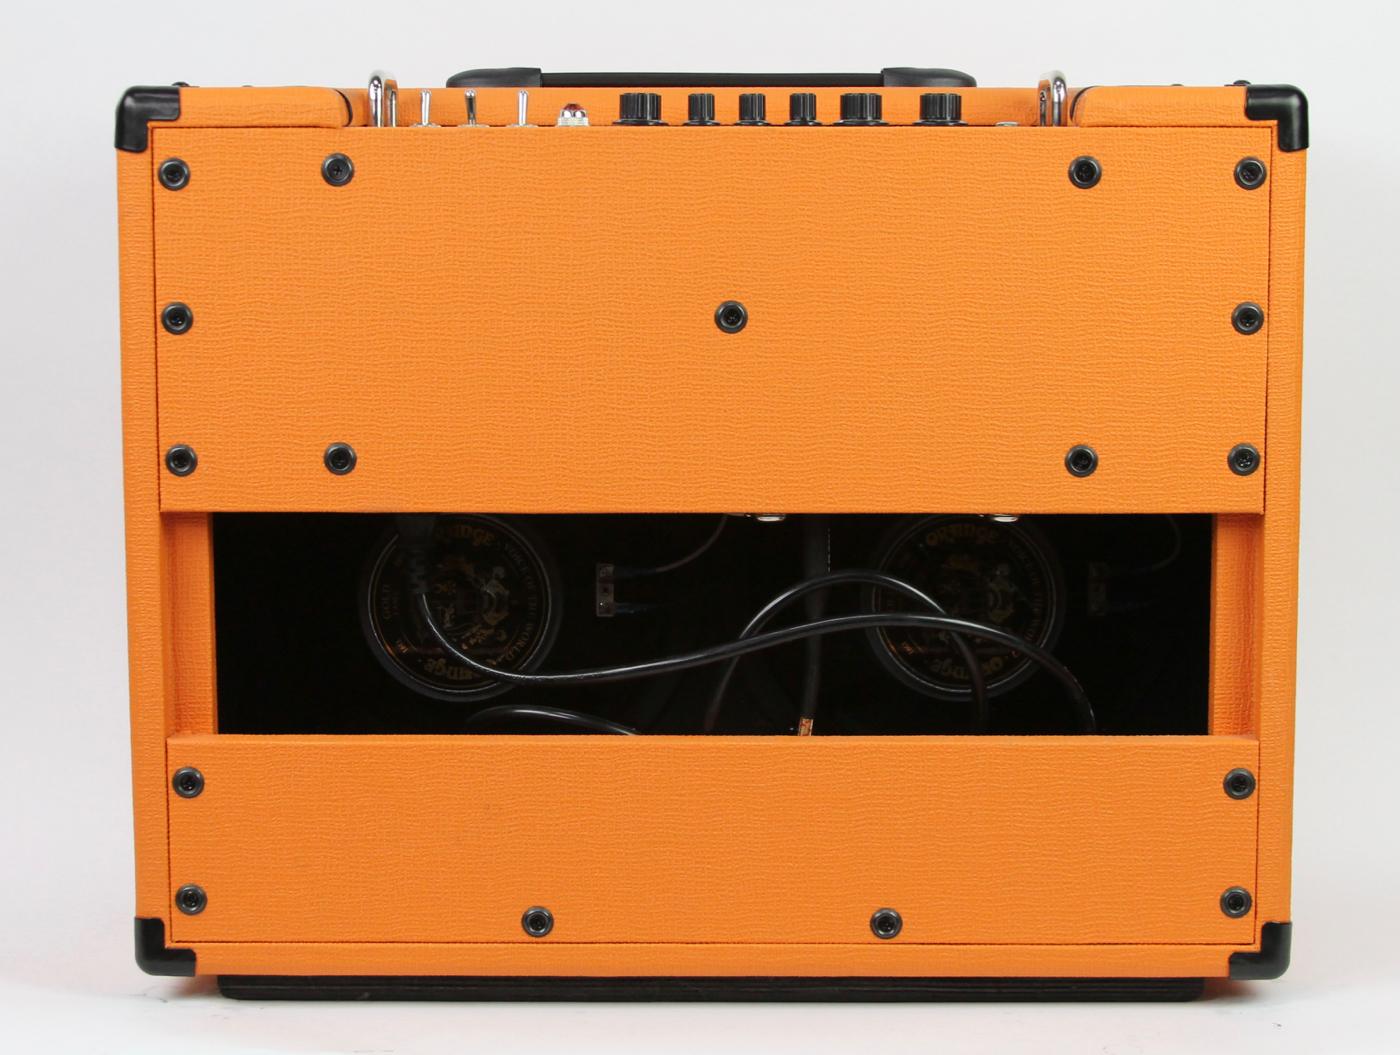 Orange Rocker 32 Combo detail 1